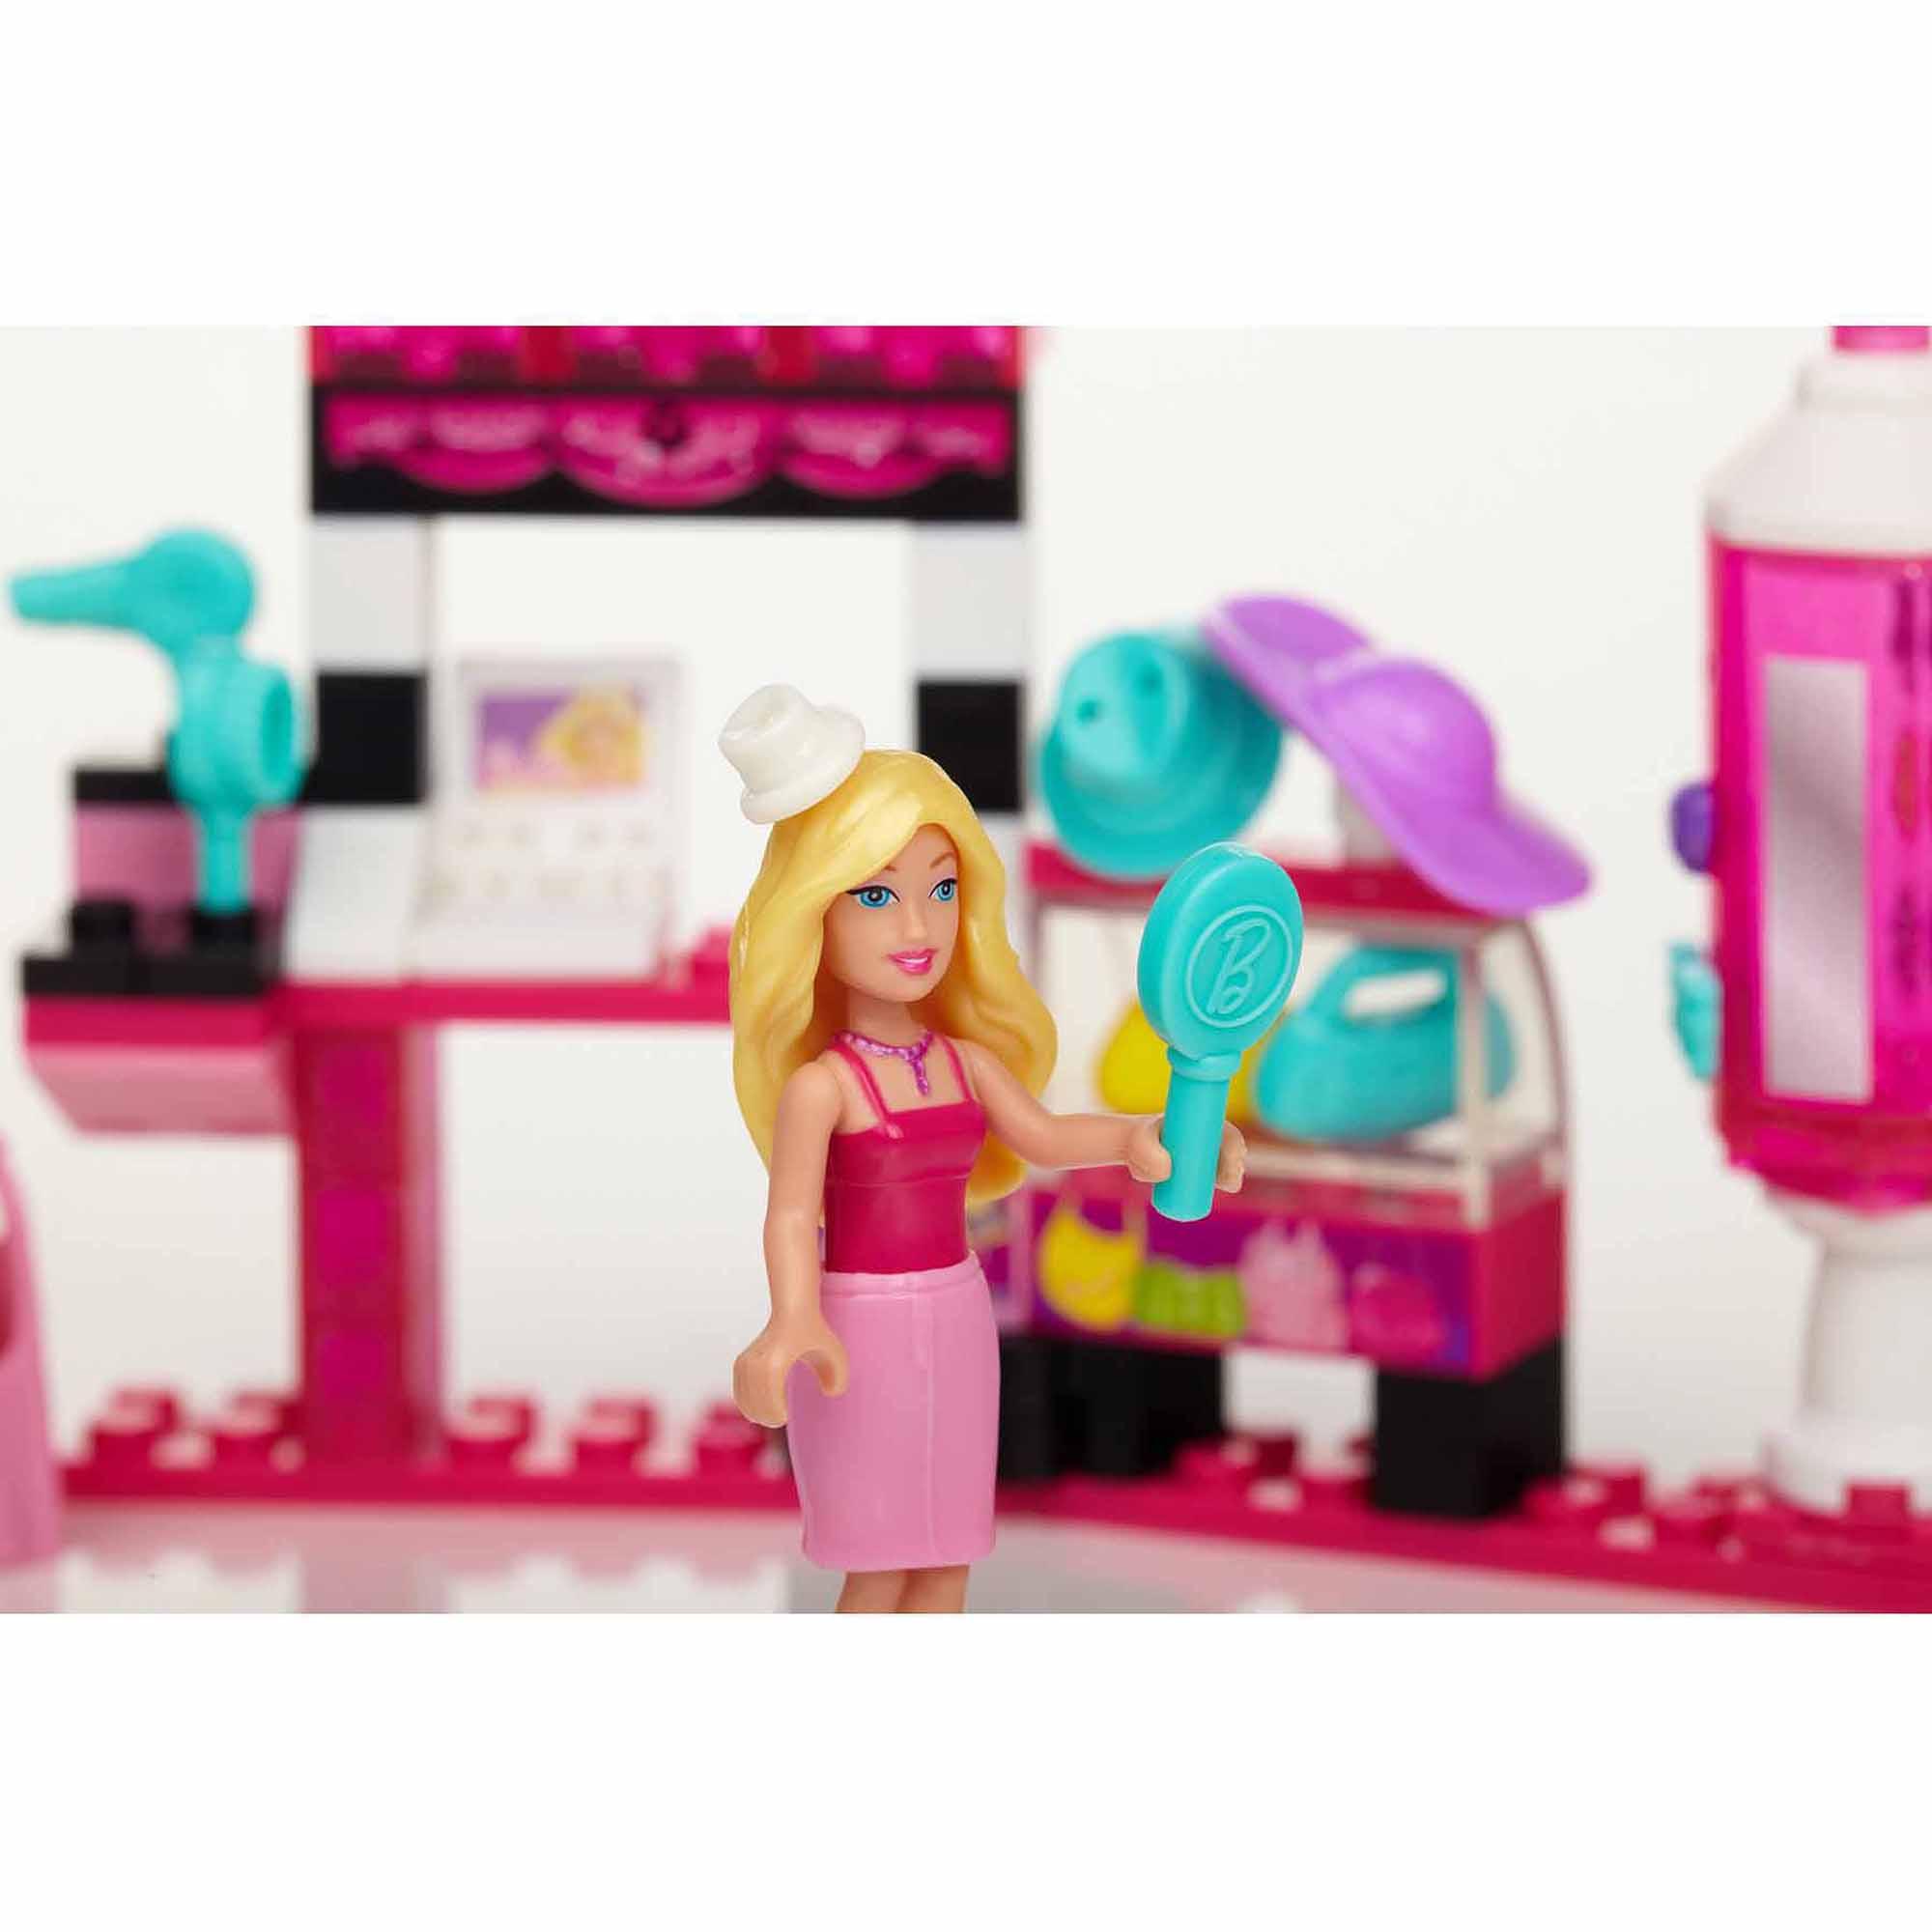 Mega Bloks Barbie Build 'n Style Fashion Stand Set #80211 by Mega Bloks